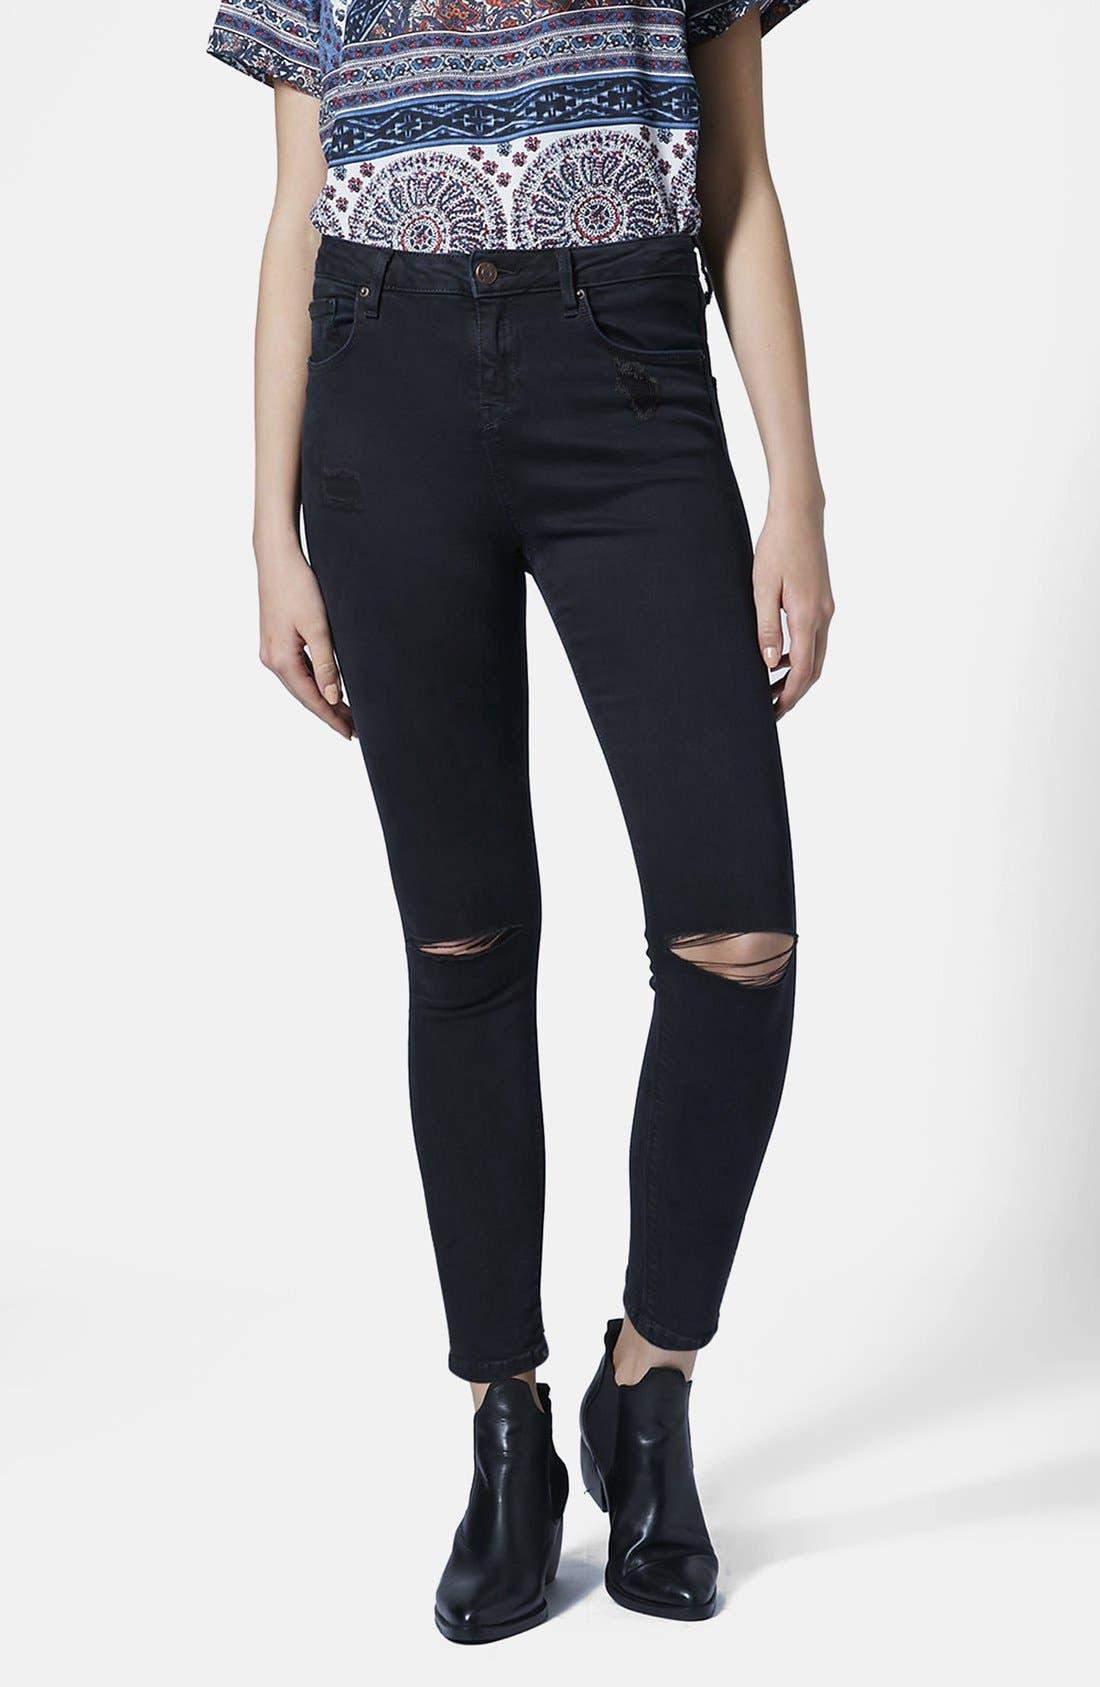 Alternate Image 1 Selected - Topshop 'Jamie' Ripped Skinny Jeans (Petite)